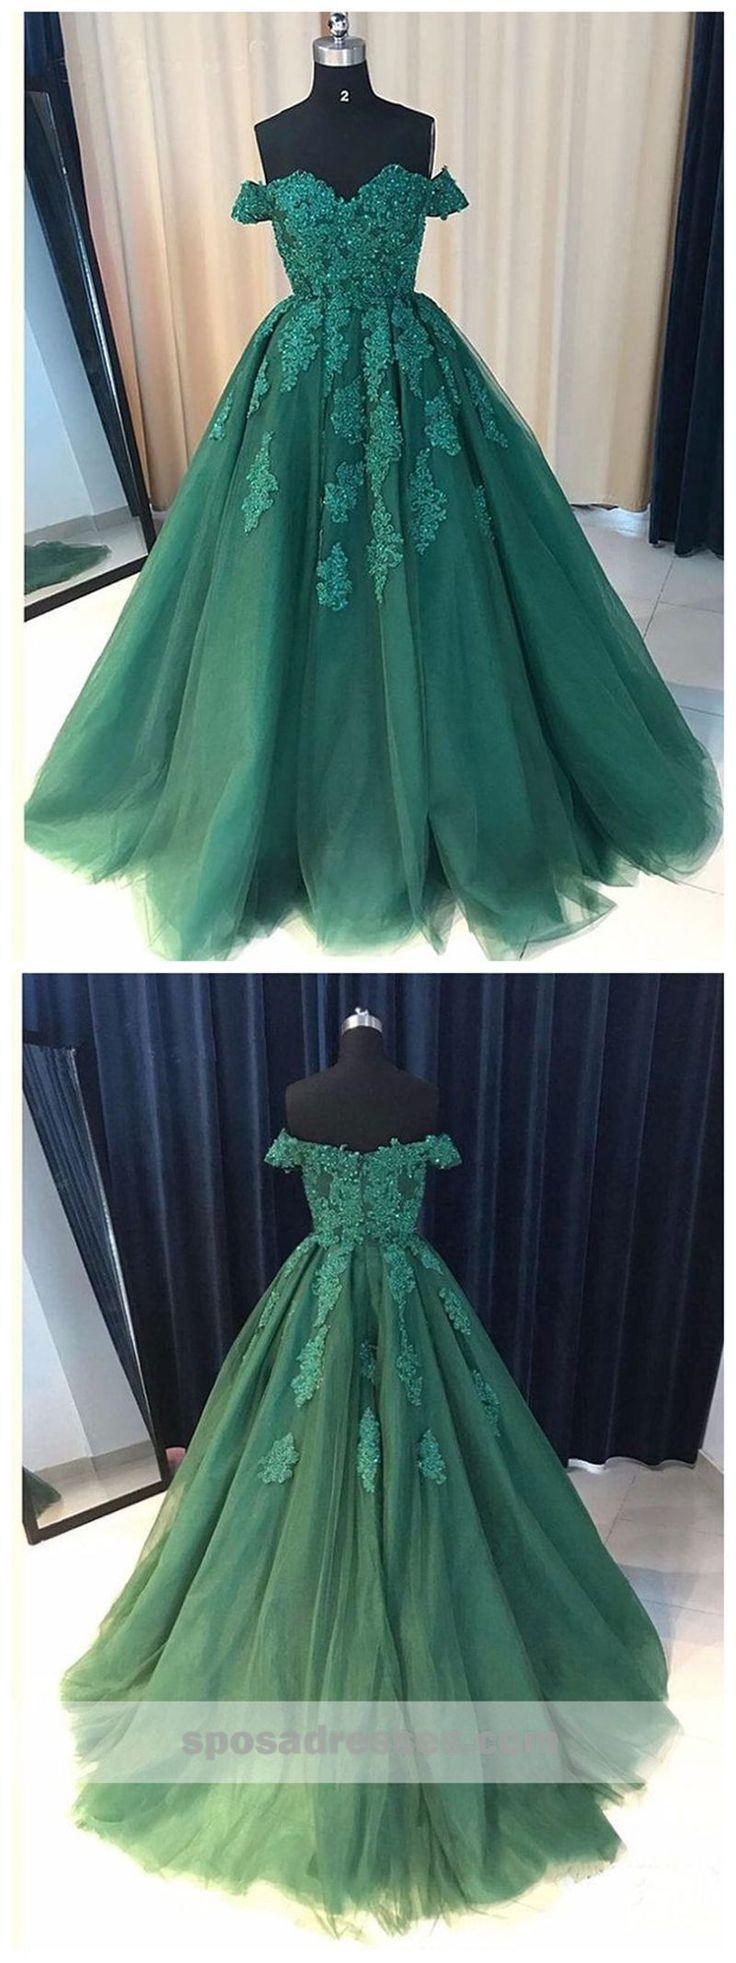 be5cb4e0637 Off Shoulder Emerald Green Lace A line Long Custom Evening Prom Dresses